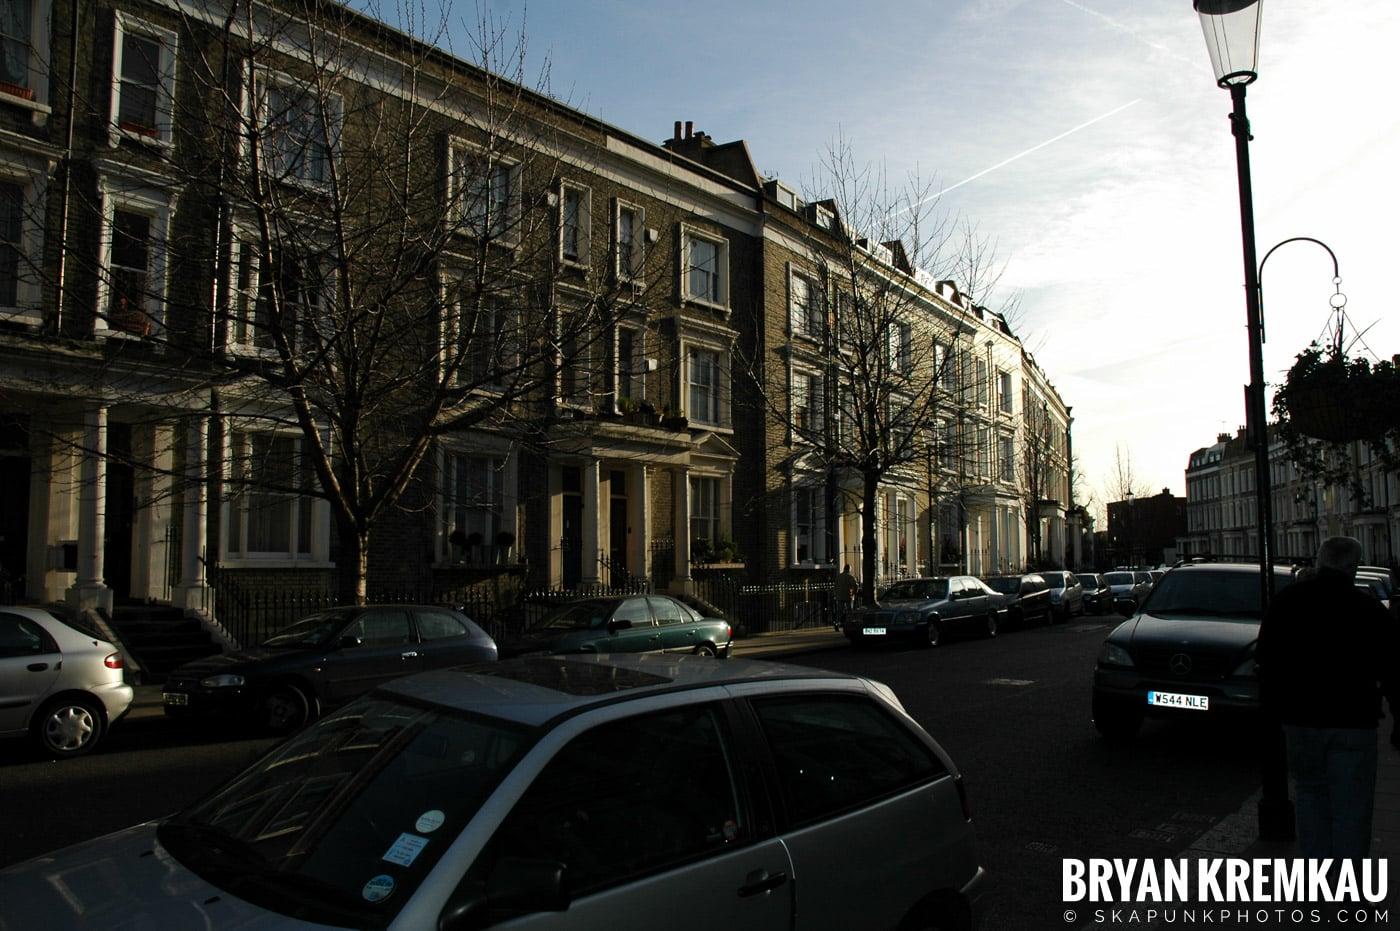 London, England - Day 2 - 12.17.05 (21)